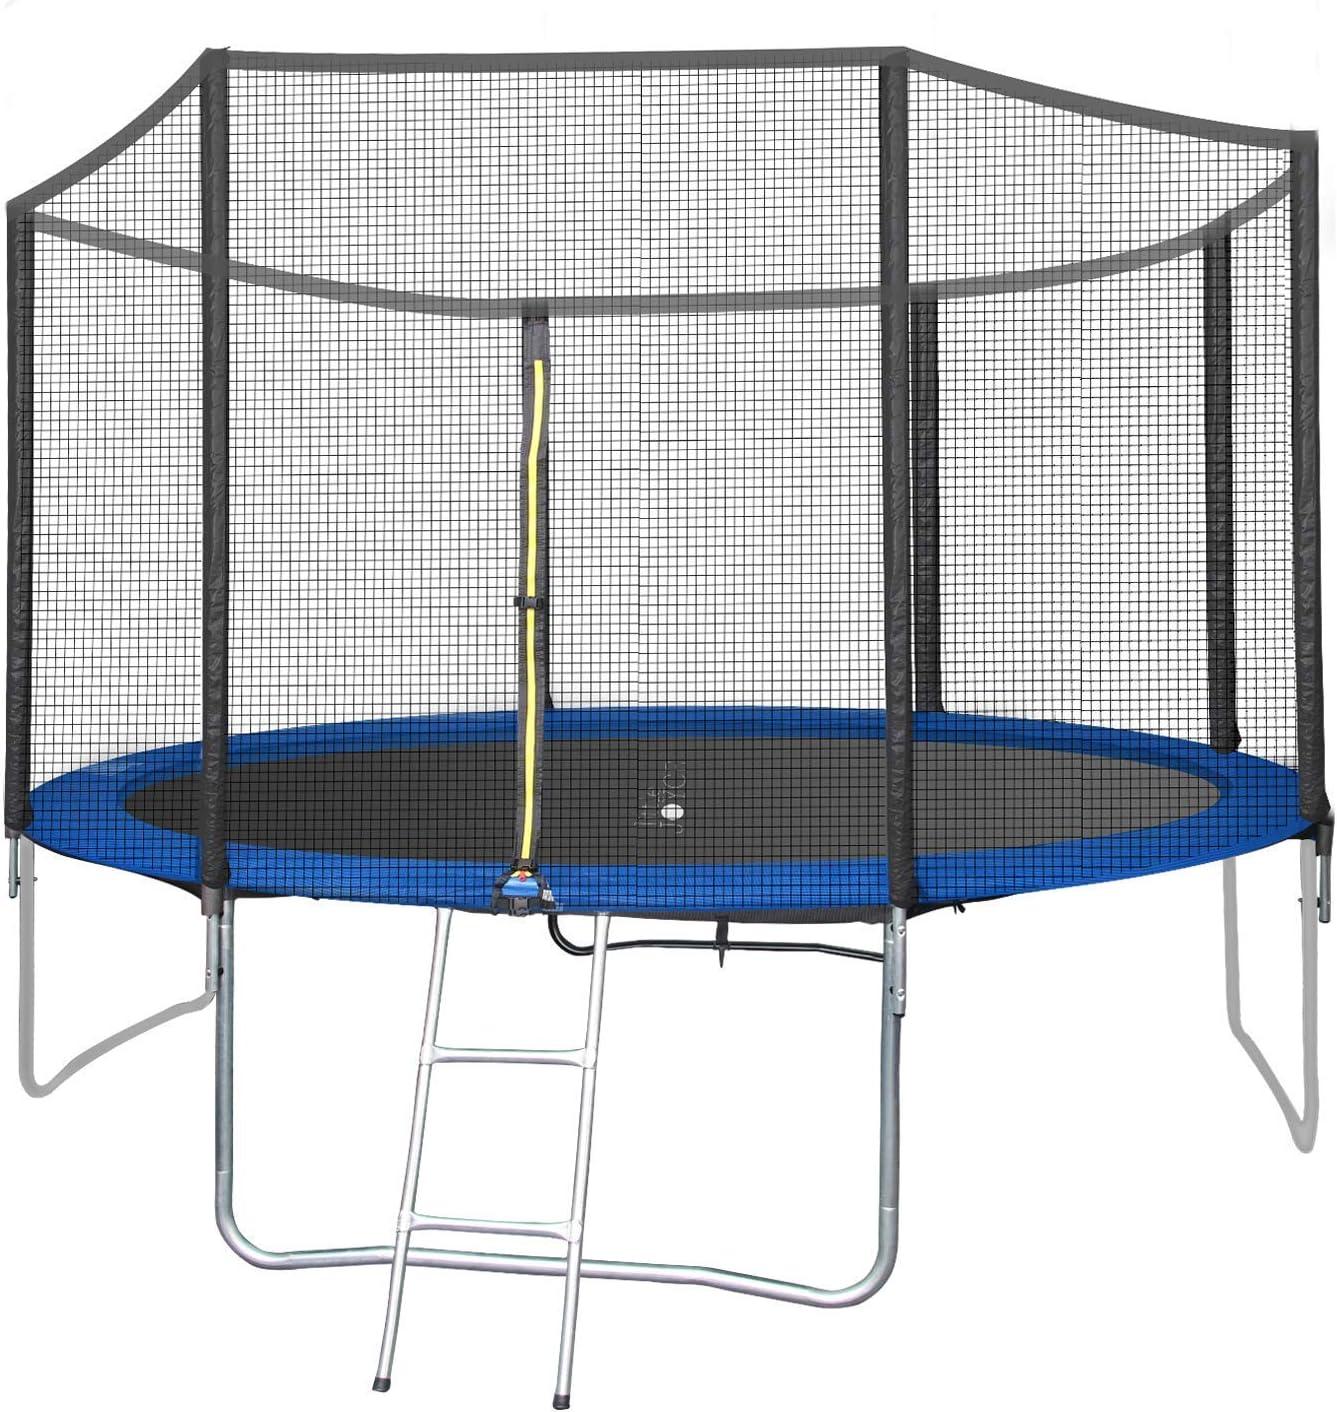 Little Joyce 12 FT Indoor Outdoor Trampoline for Kids Adults wit